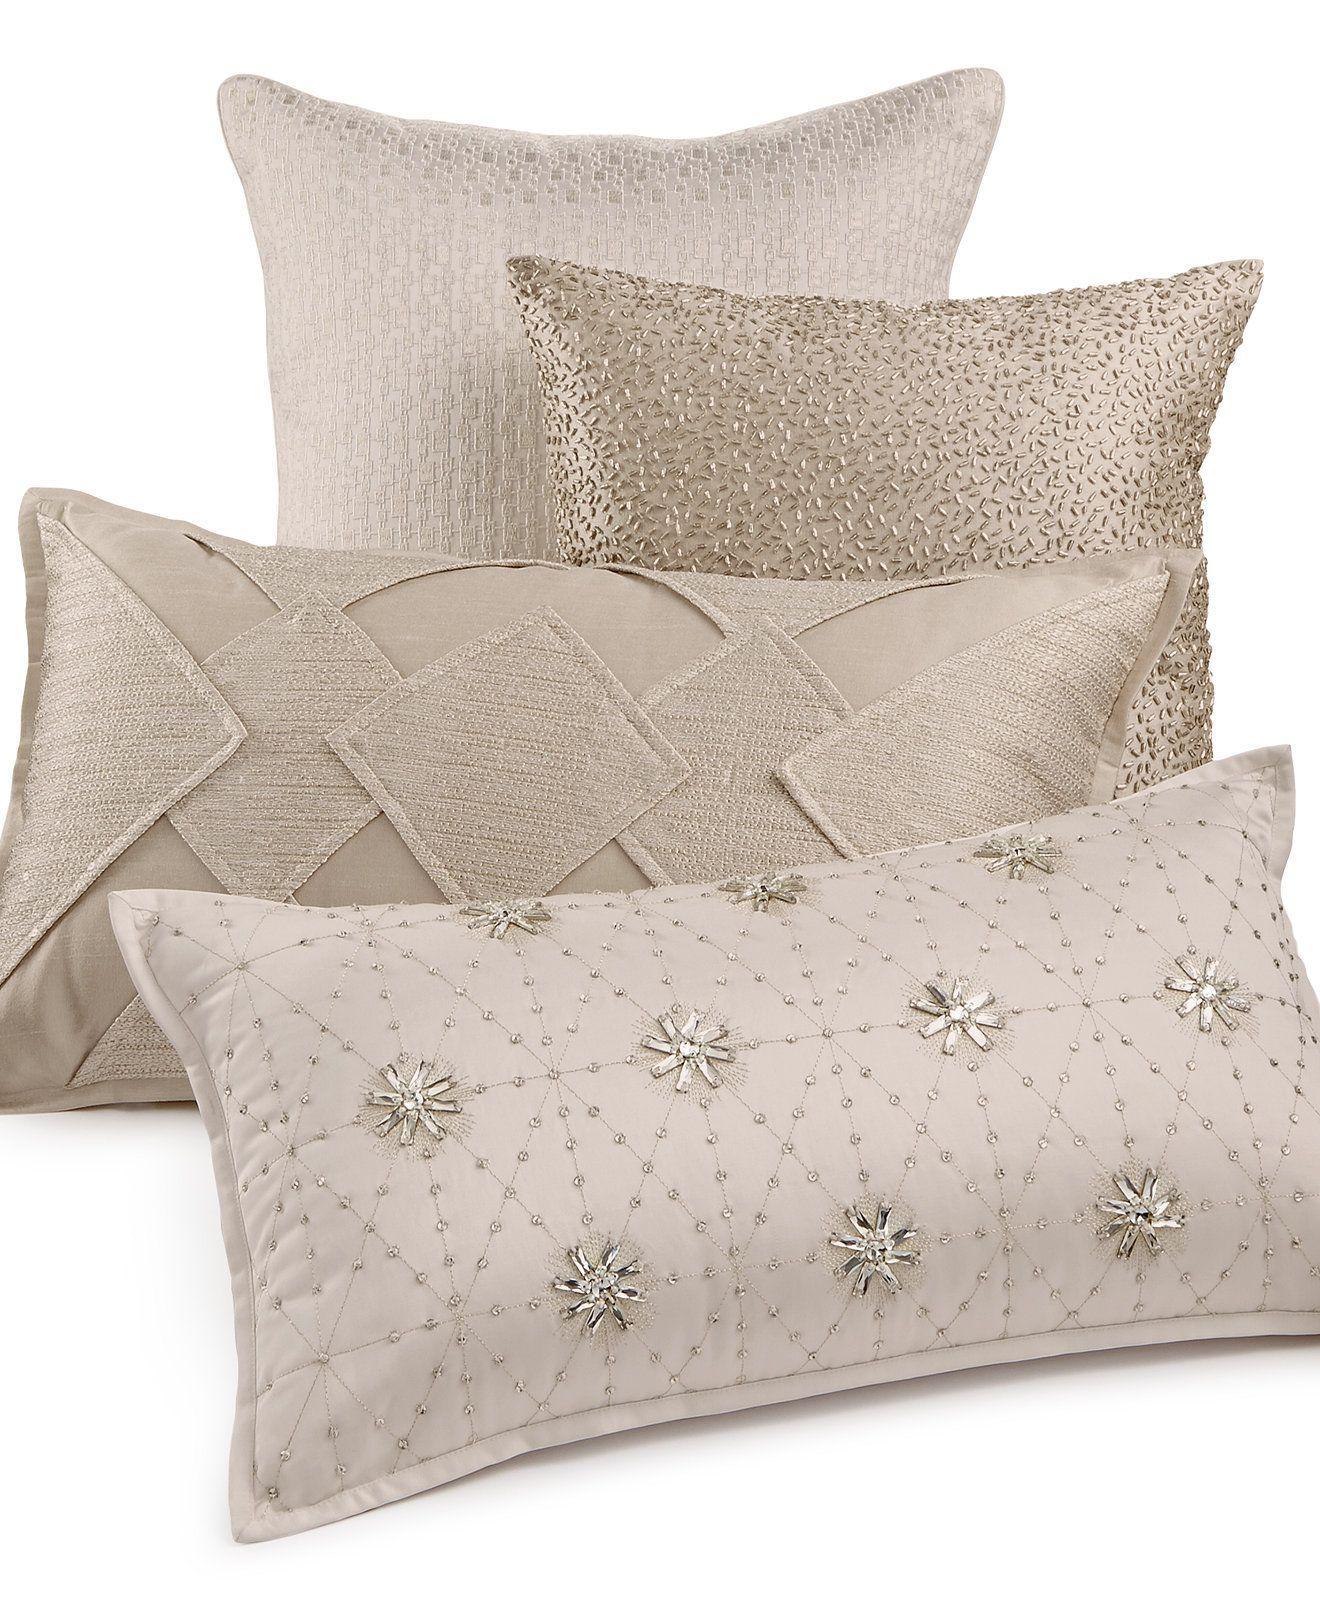 Hotel Collection Finest Sunburst Decorative Pillow Collection